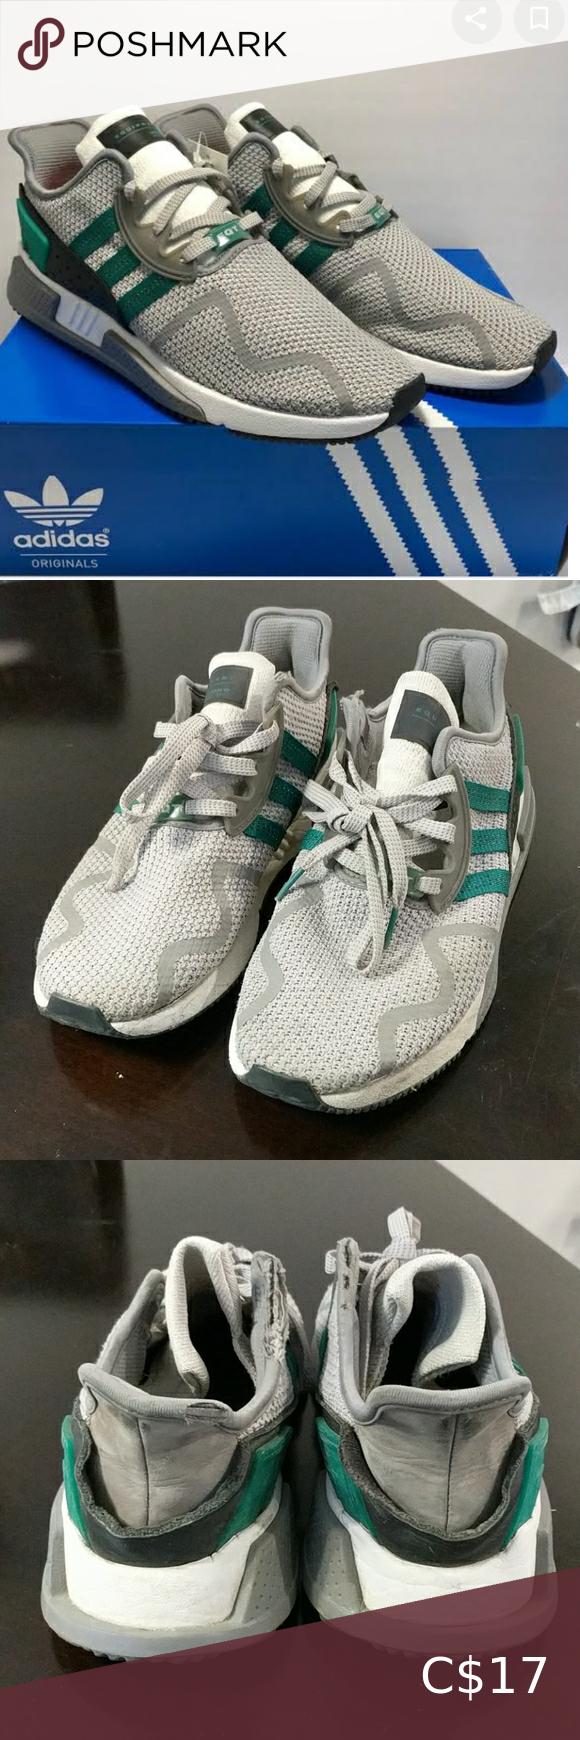 adidas eqt cushion adv shoes size 8